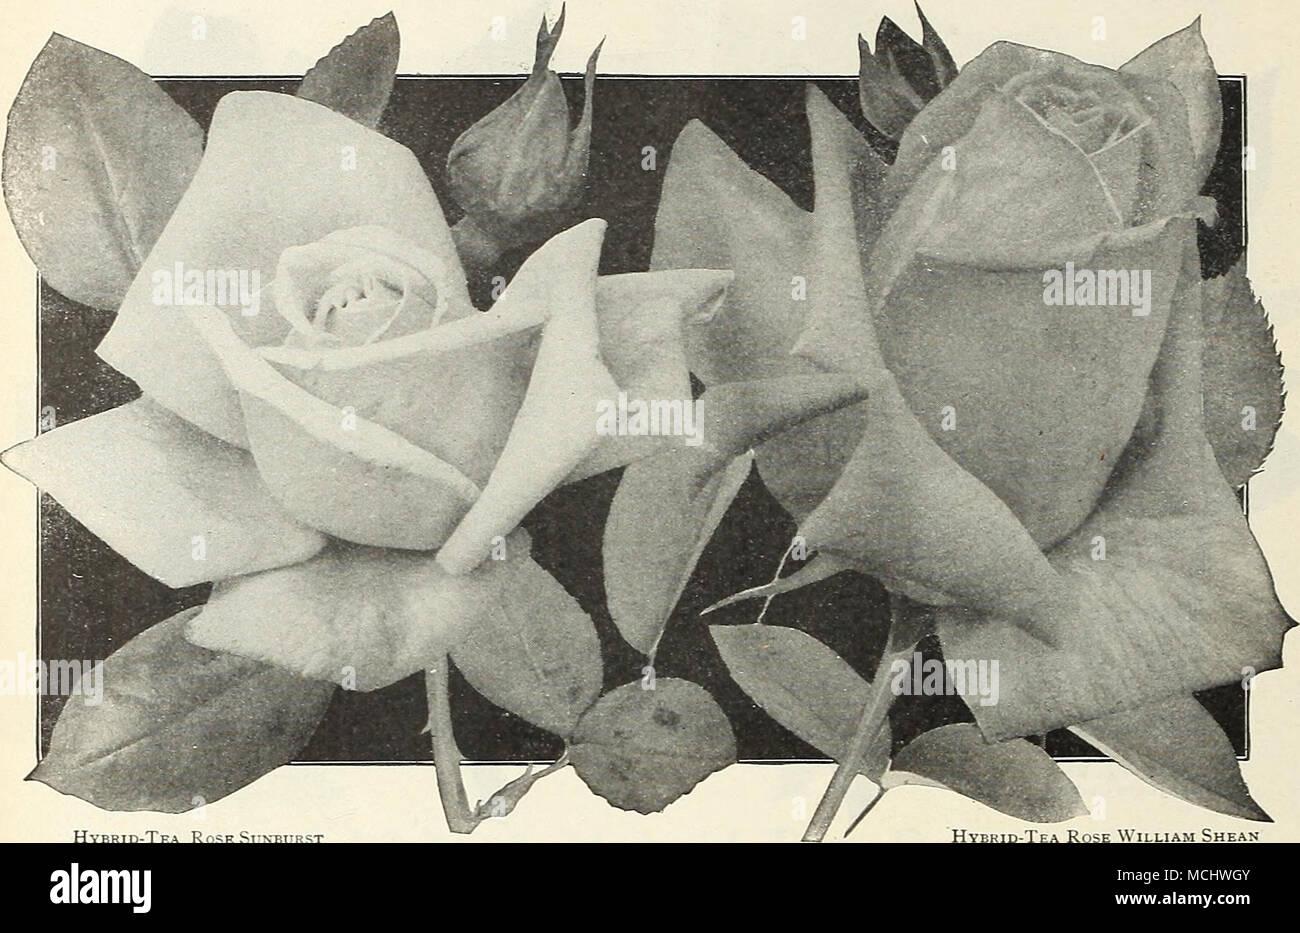 Hybrid Tea Rose Sunburst Hybrid Tea Rose William Shean Select List